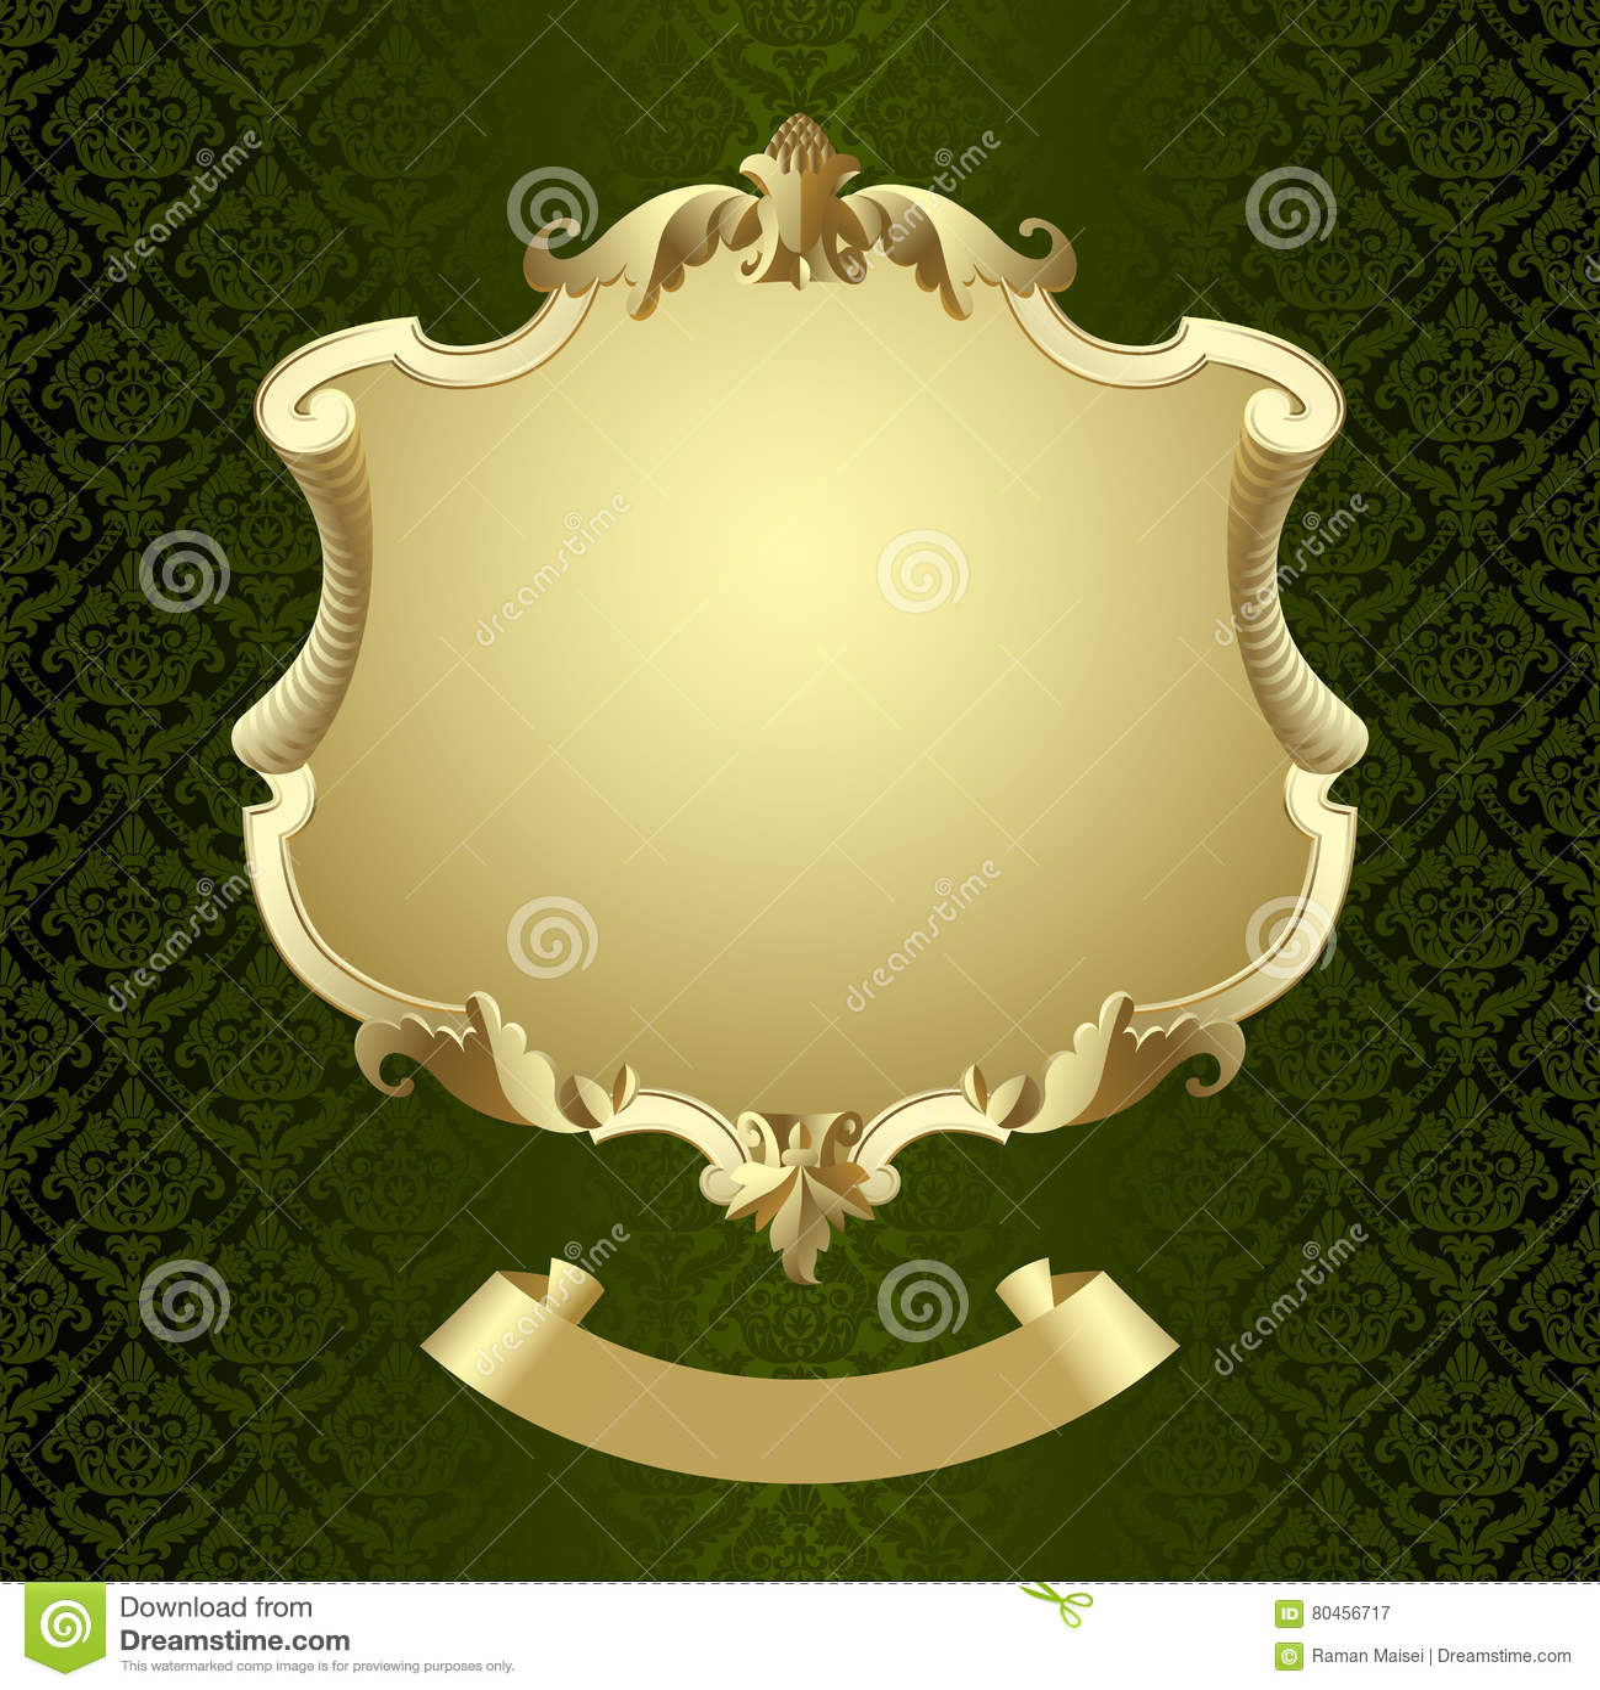 Vintage Gold Framed Shield With Banner On Dark Green Baroque Orn ...